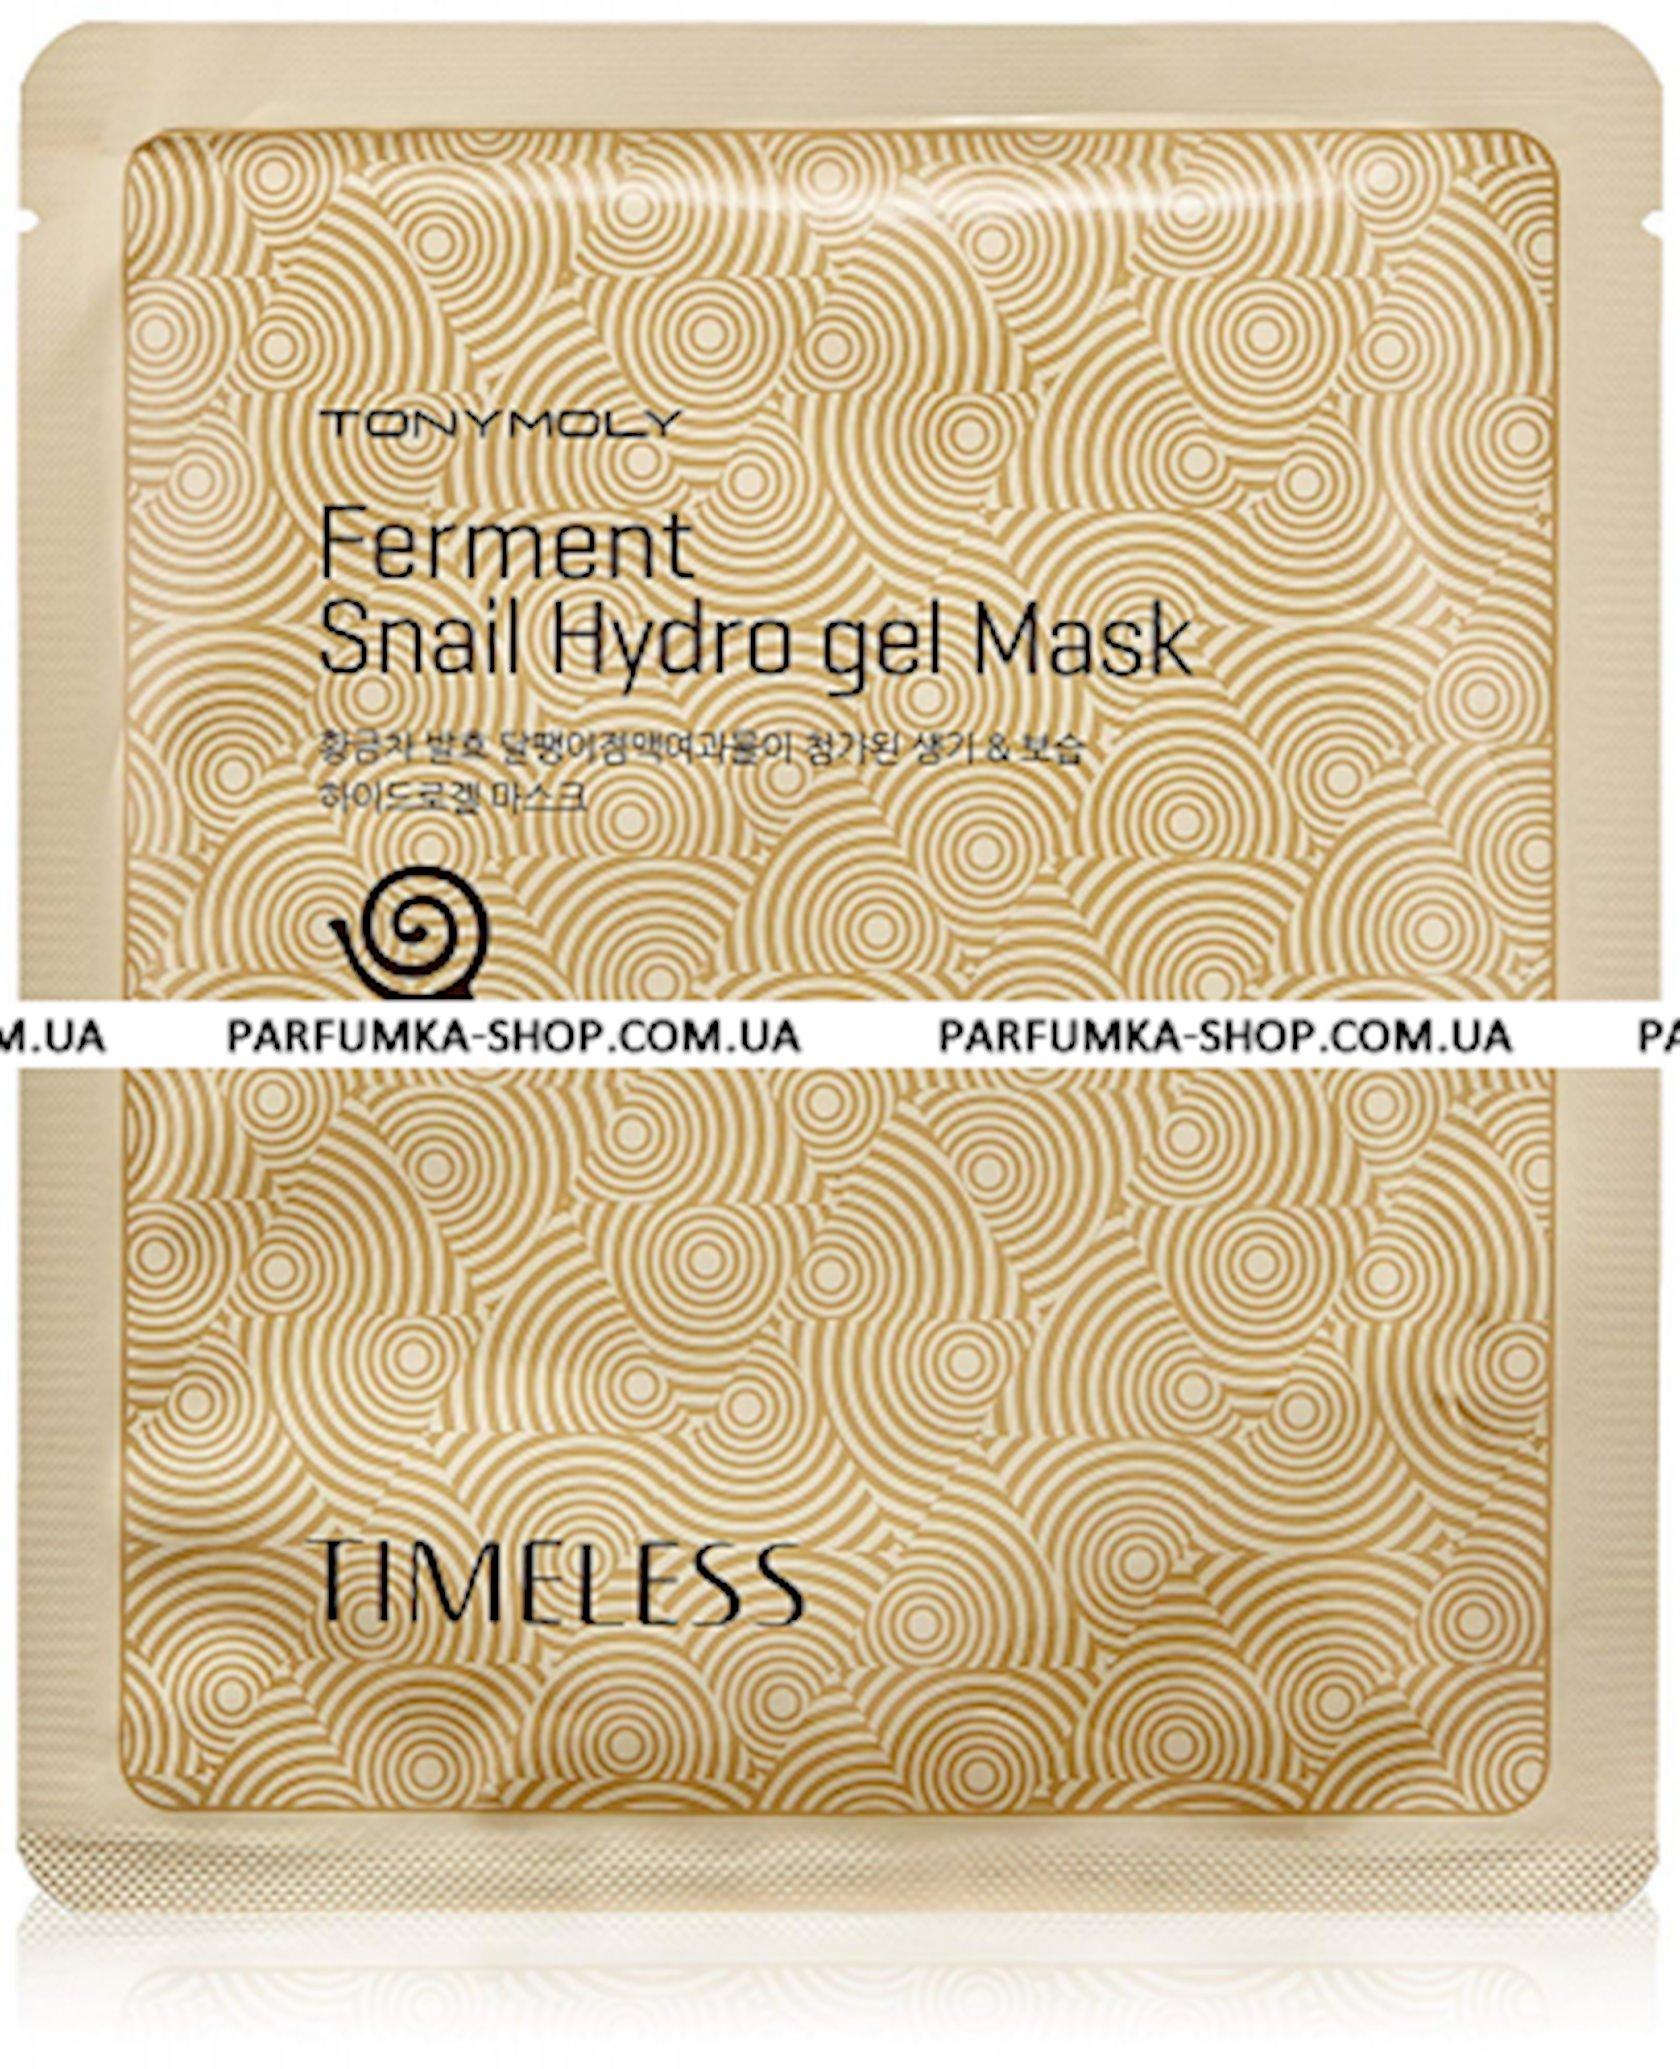 Parça maska Tony Moly Timeless Ferment Snail Hydro Gel Mask